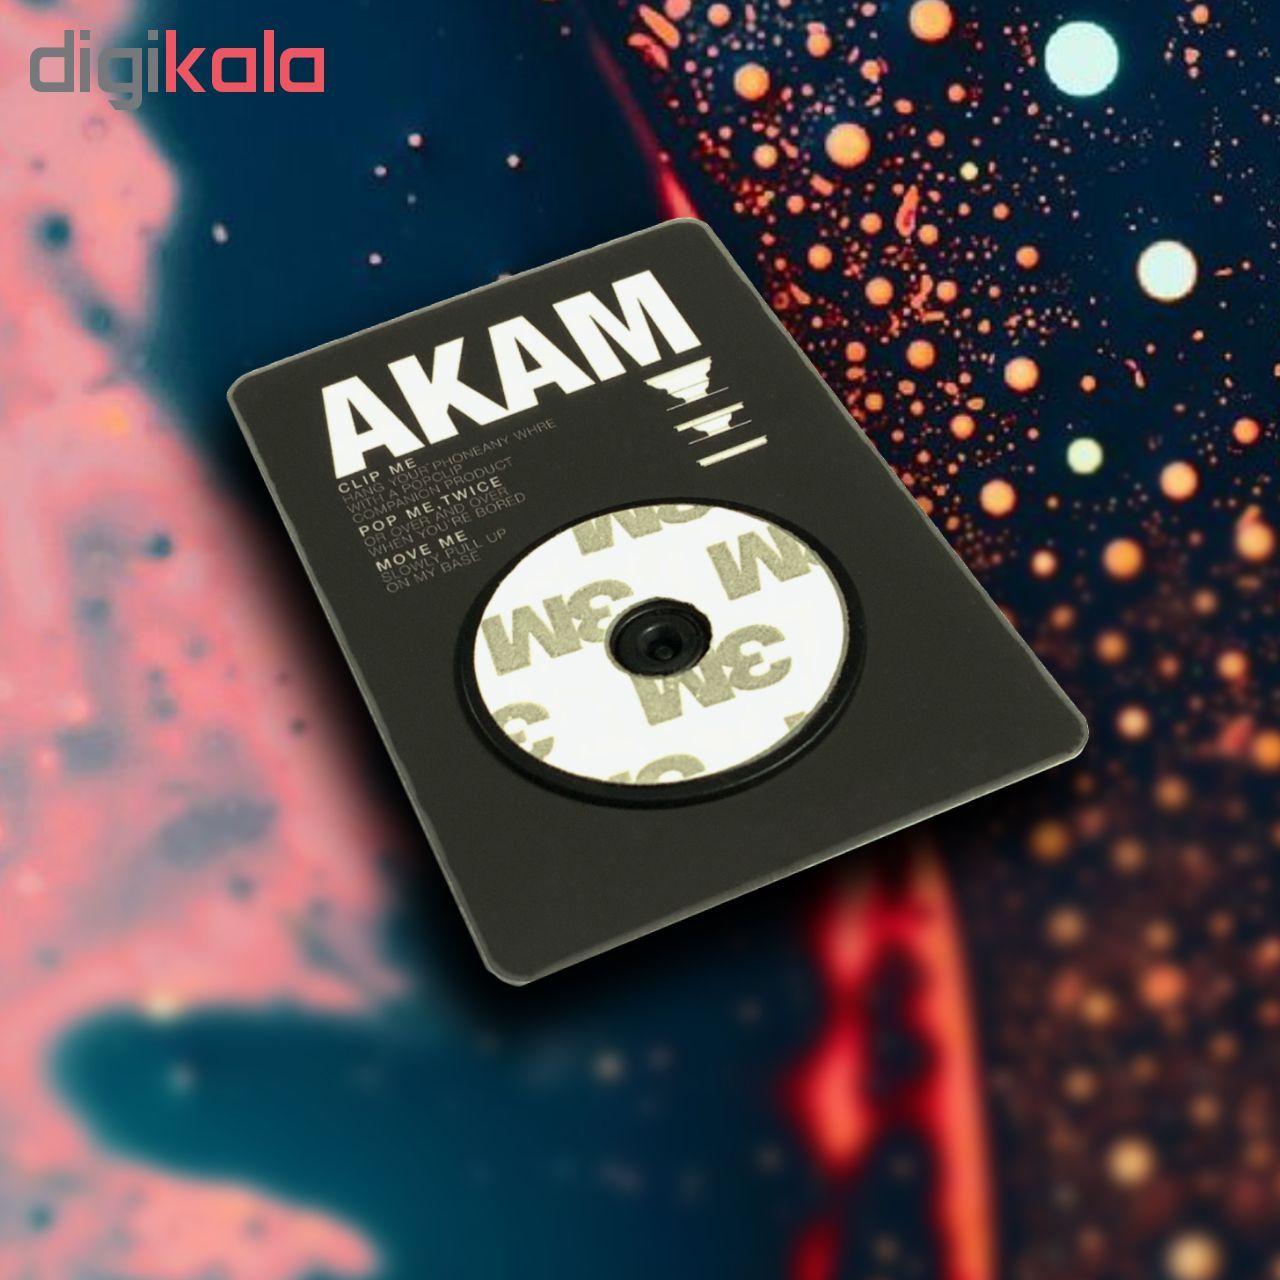 پایه نگهدارنده گوشی موبایل پاپ سوکت آکام مدل APS0057 main 1 2